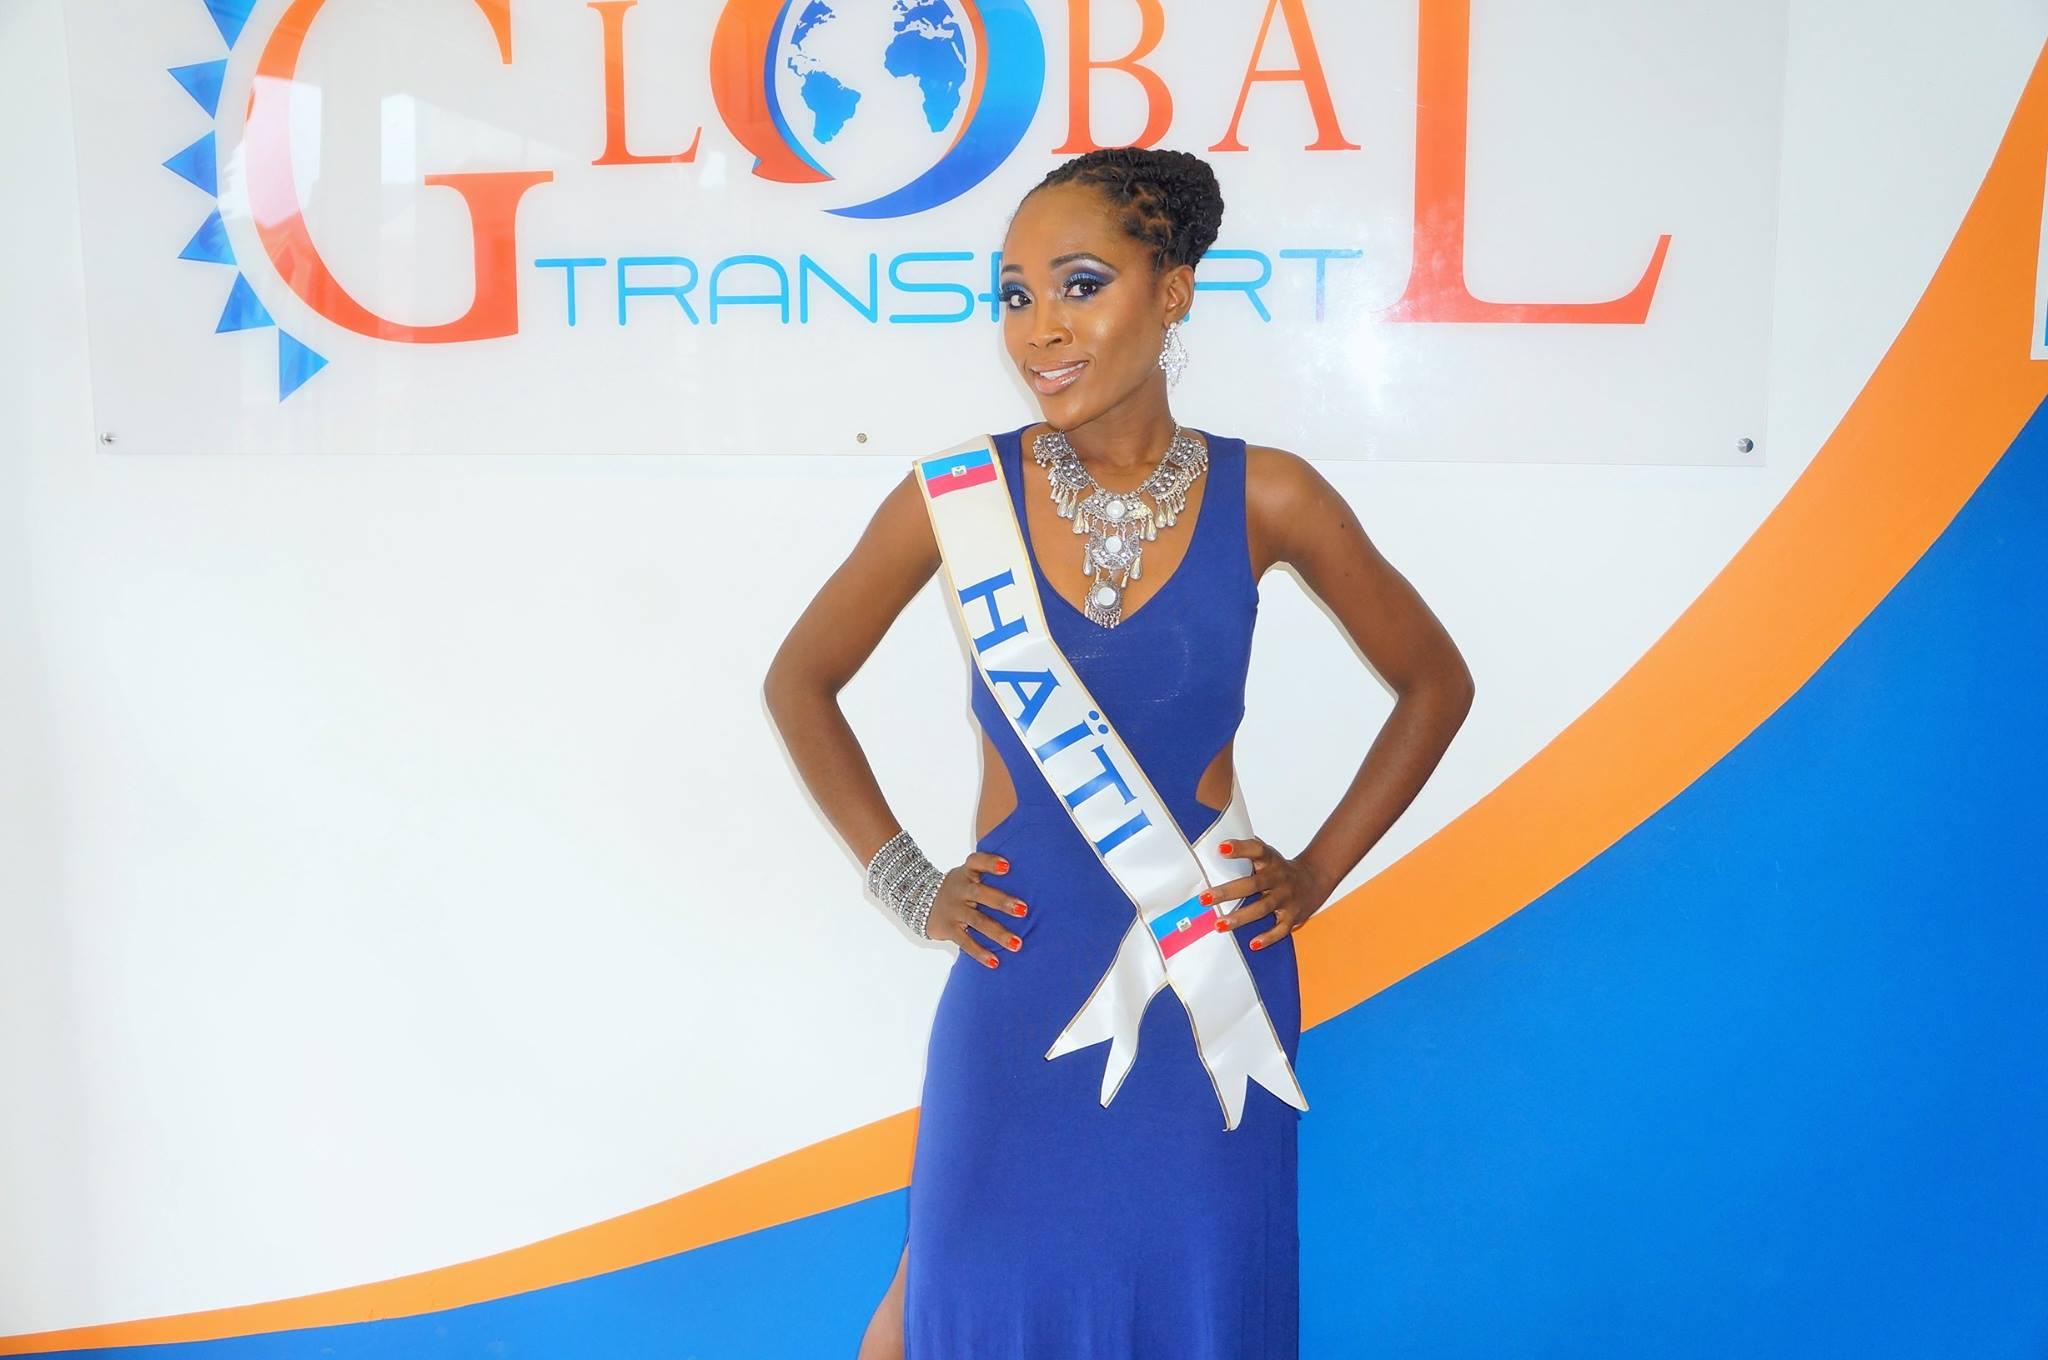 Visite de Miss International Elegeance mother 2016 – Haïti chez Global Transfert Saint-Martin